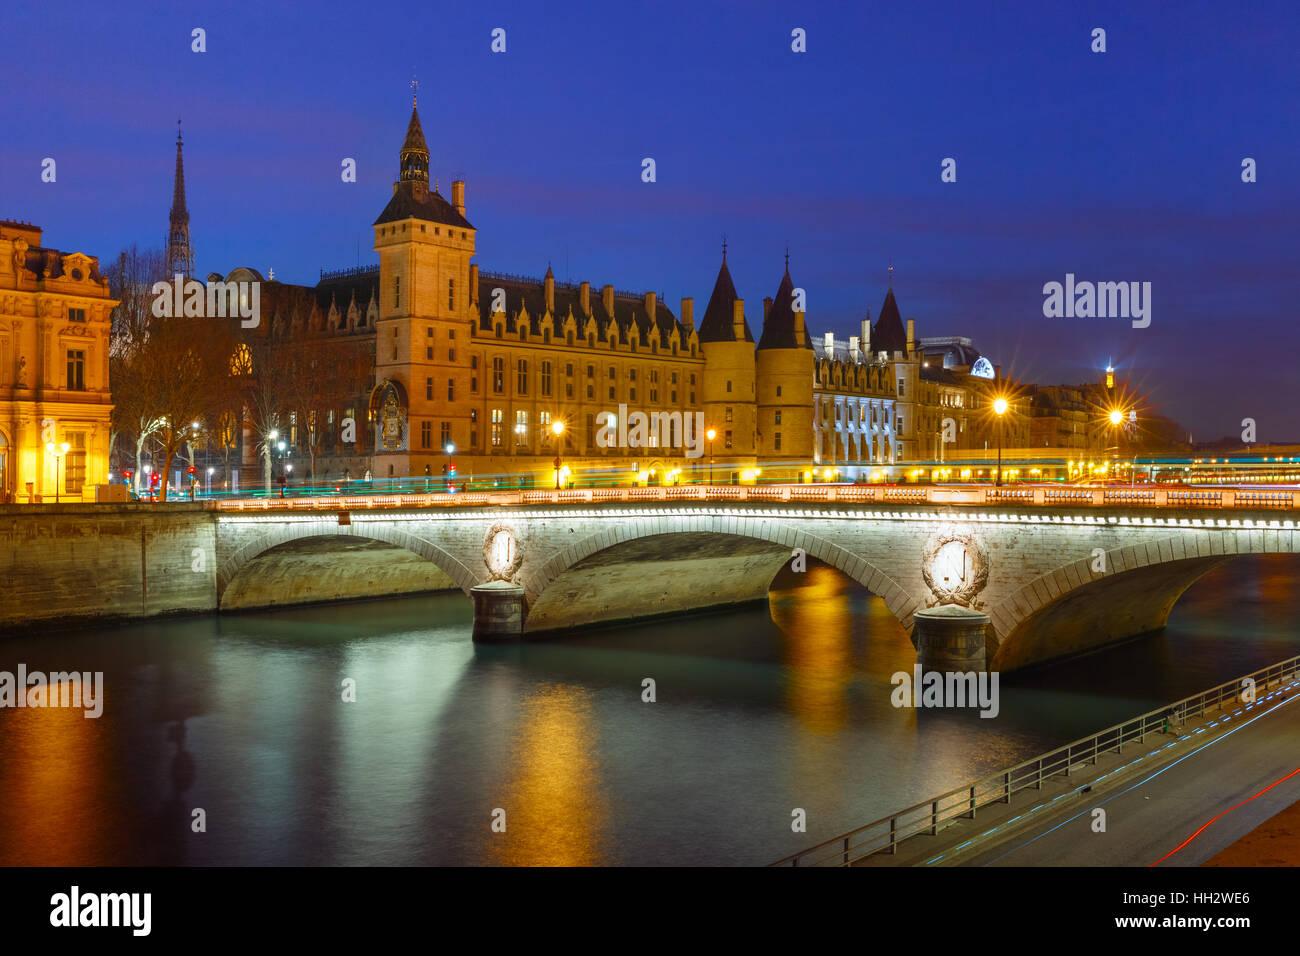 Conciergerie at night, Paris, France - Stock Image